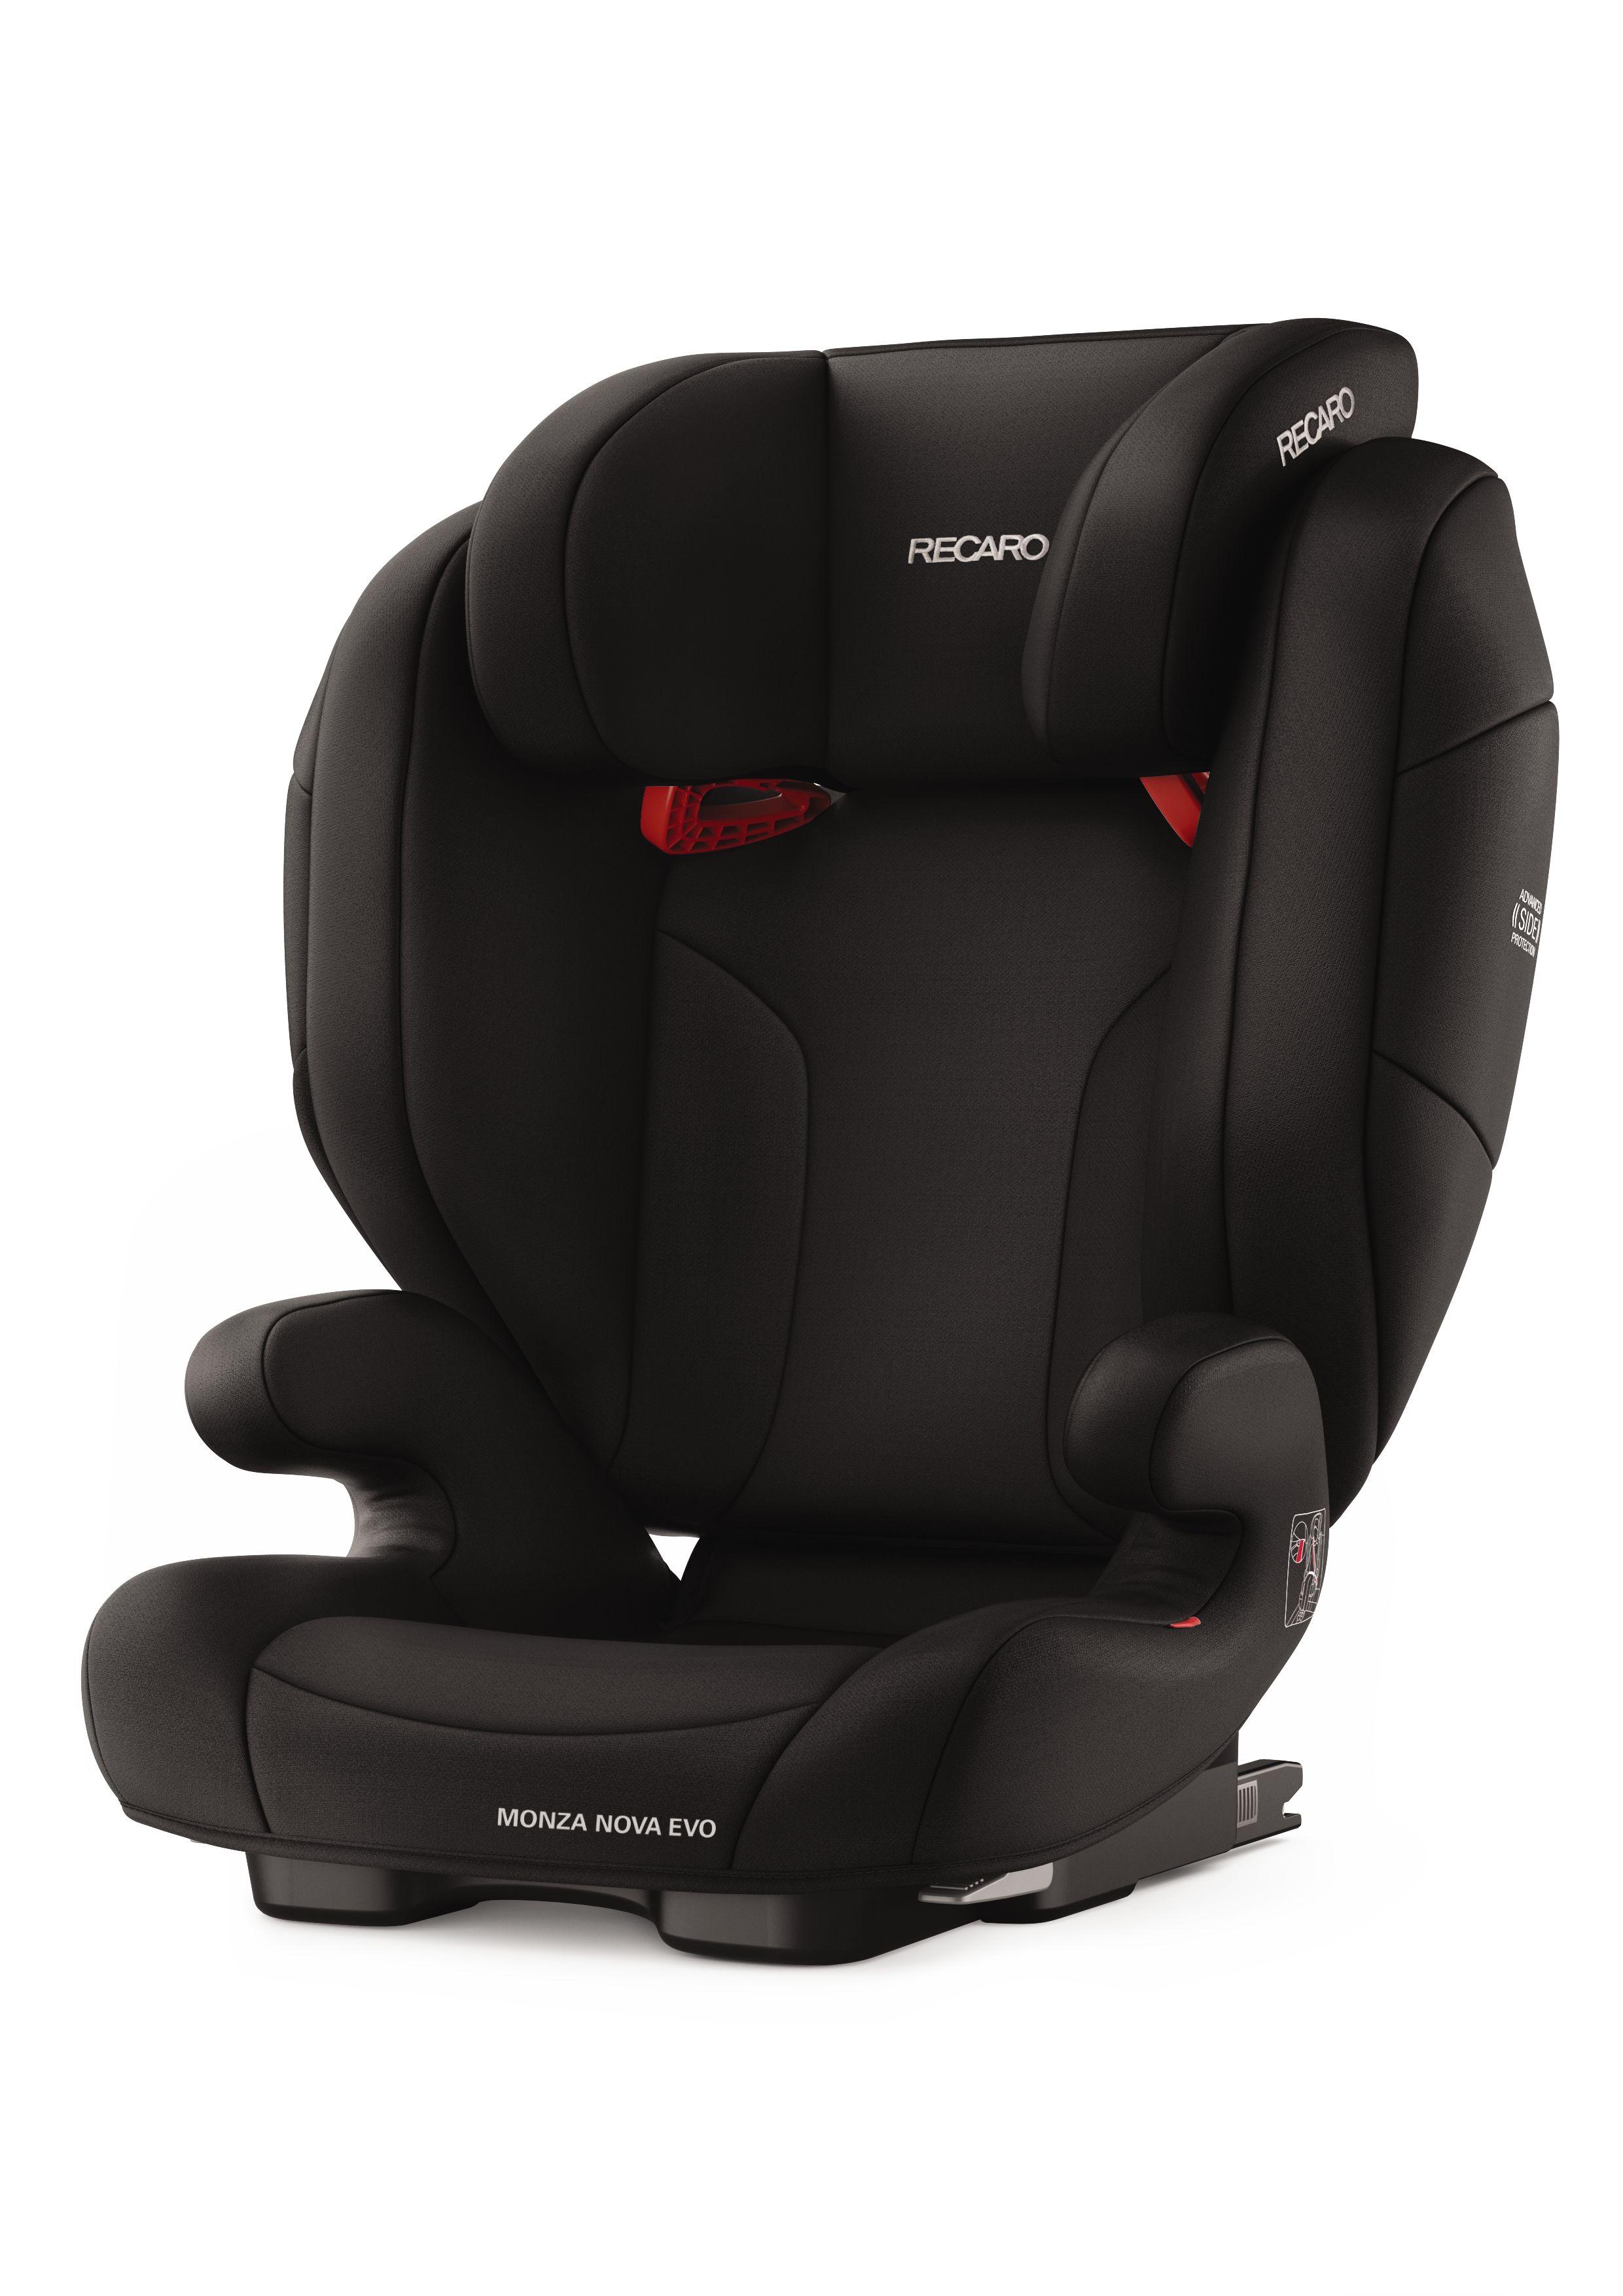 Recaro Child Car Seat Monza Nova Evo Seatfix 2019 Performance Black Buy At Kidsroom Car Seats